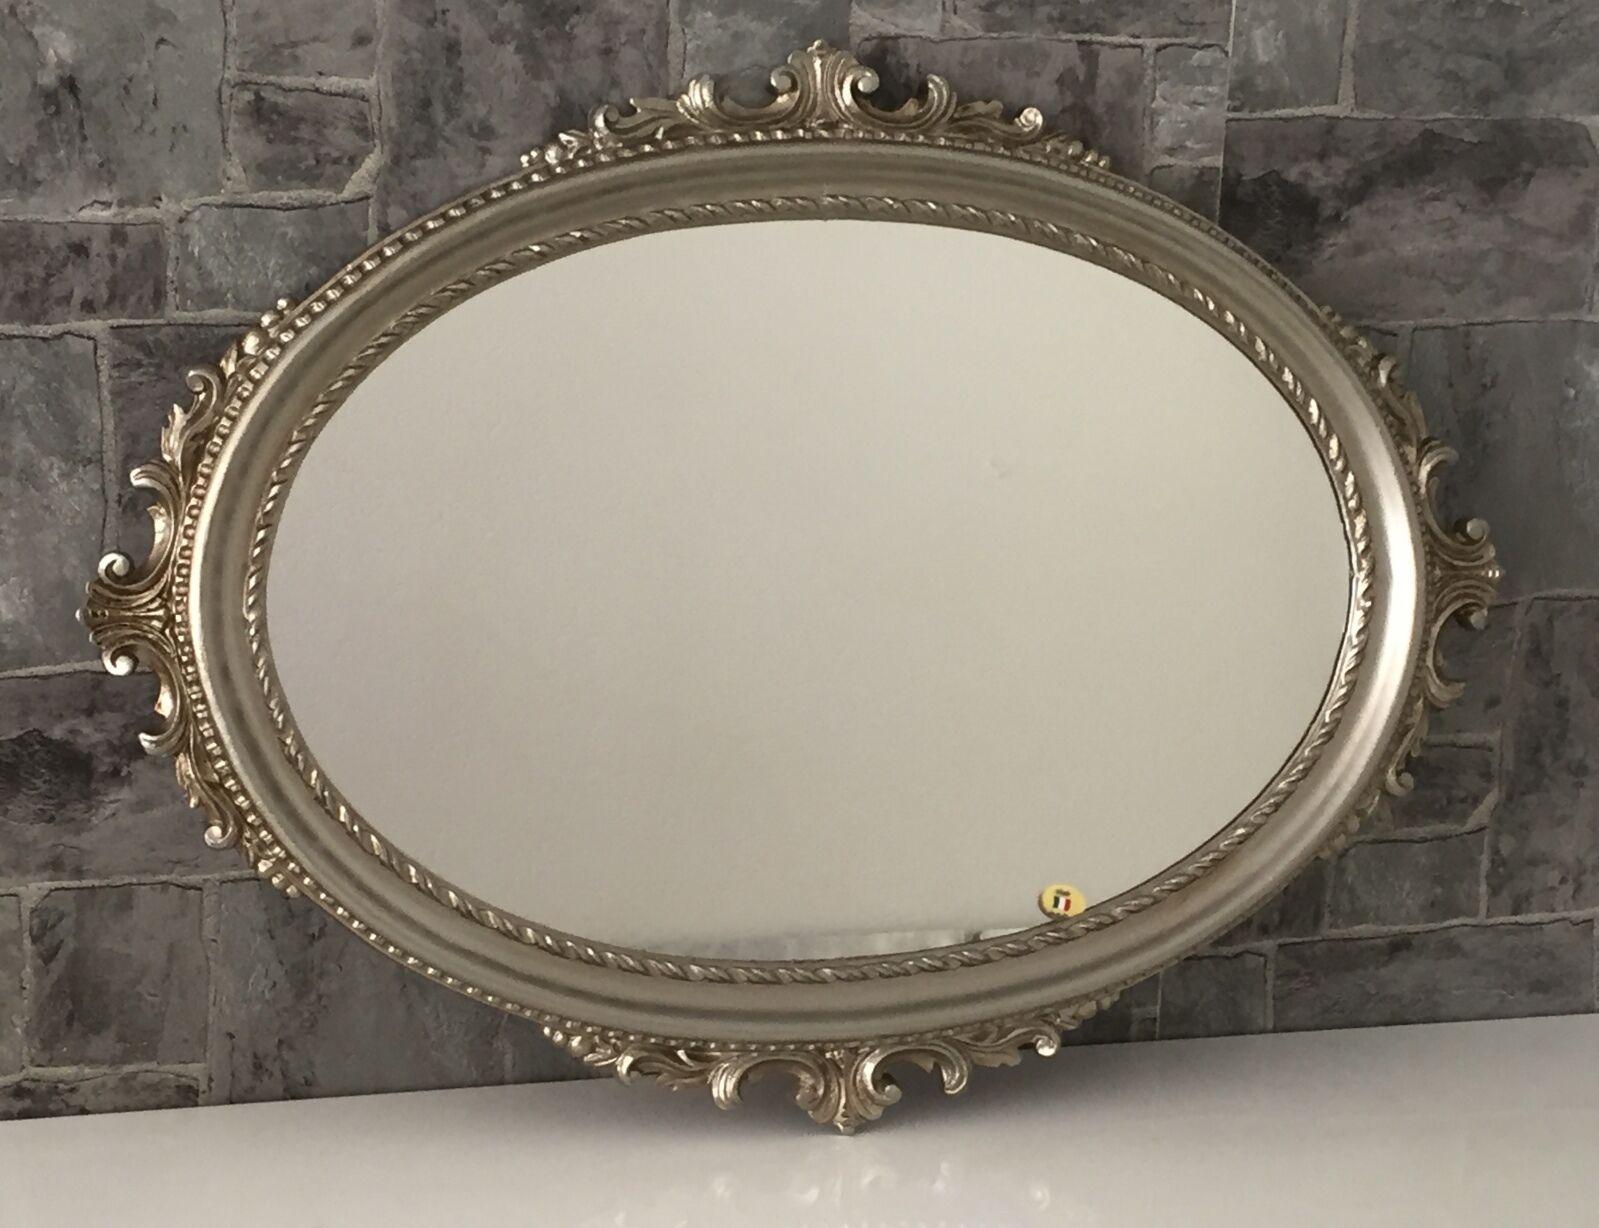 wandspiegel antik silber oval barock badspiegel spiegel. Black Bedroom Furniture Sets. Home Design Ideas